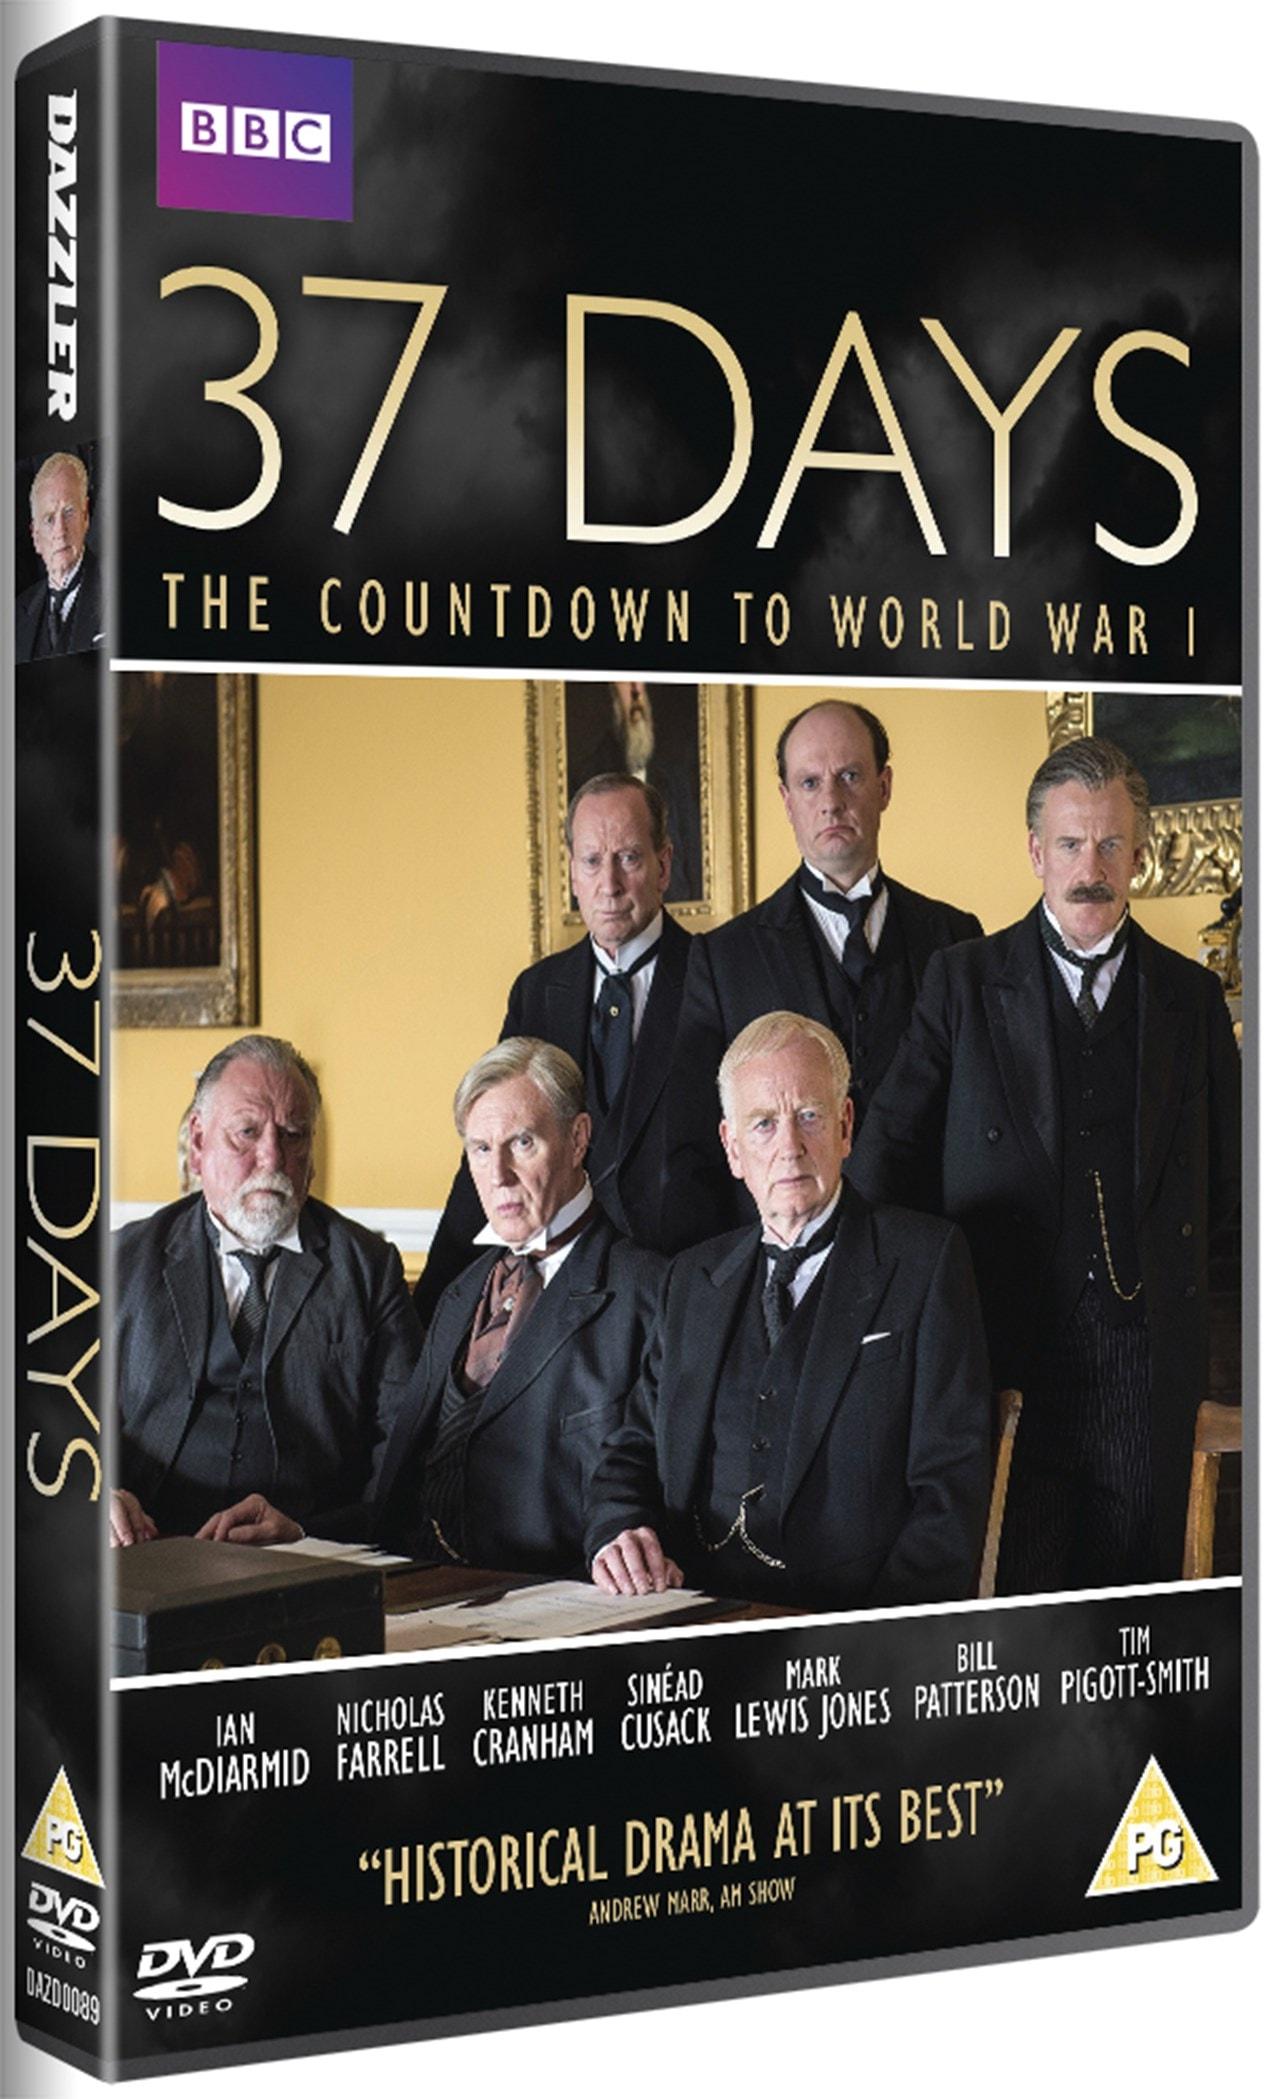 37 Days - The Countdown to World War I - 2